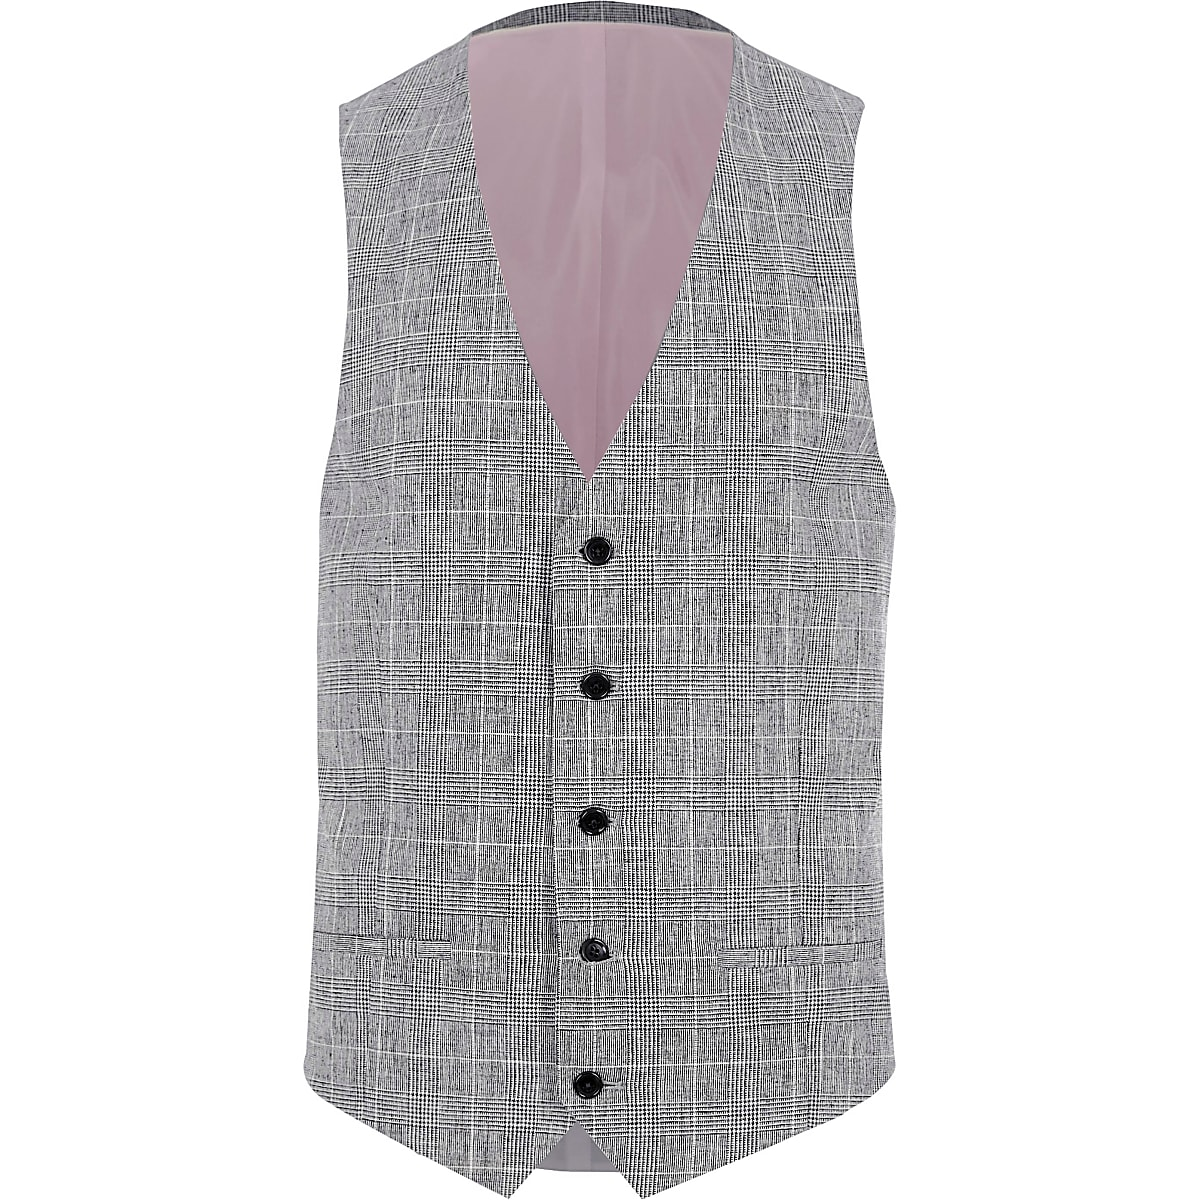 53aaa406 Light grey textured check suit waistcoat - Waistcoats - Suits - men